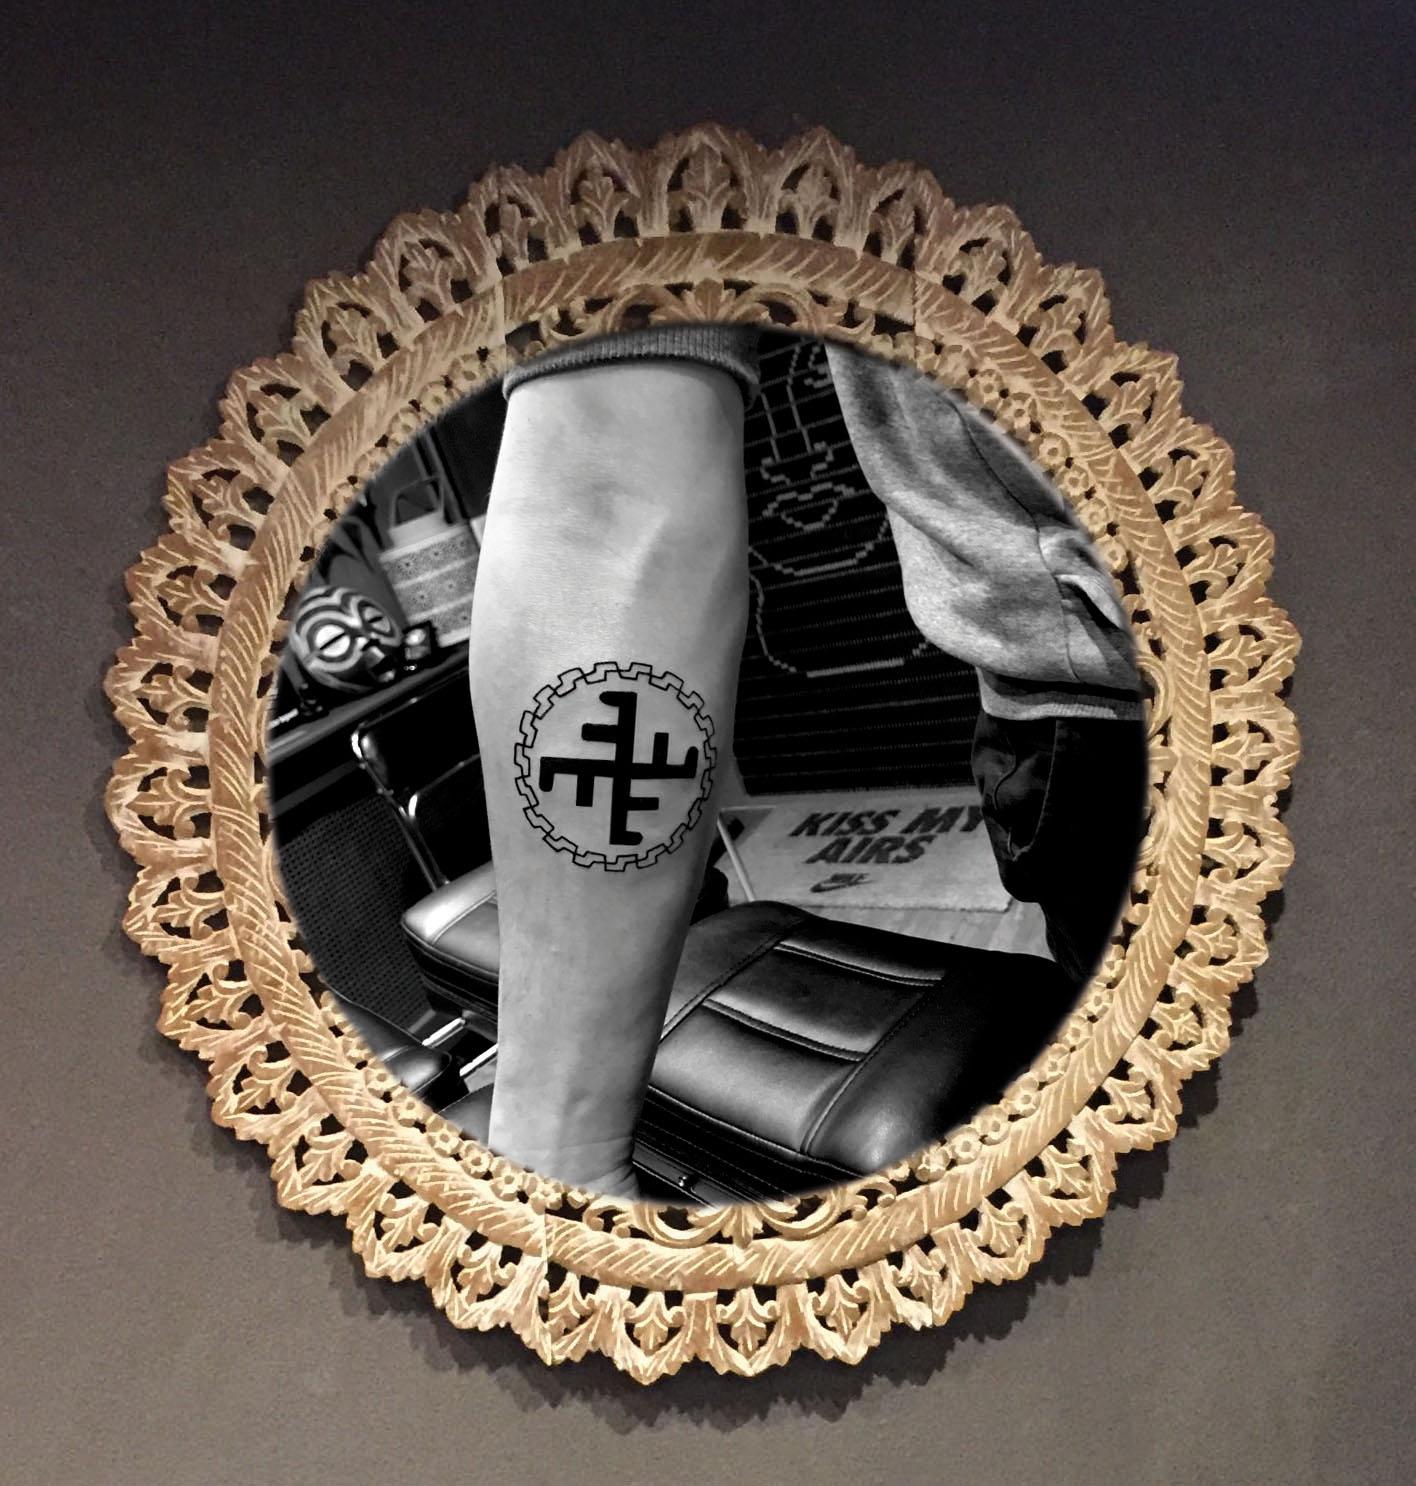 Russisch familie teken tatoeage